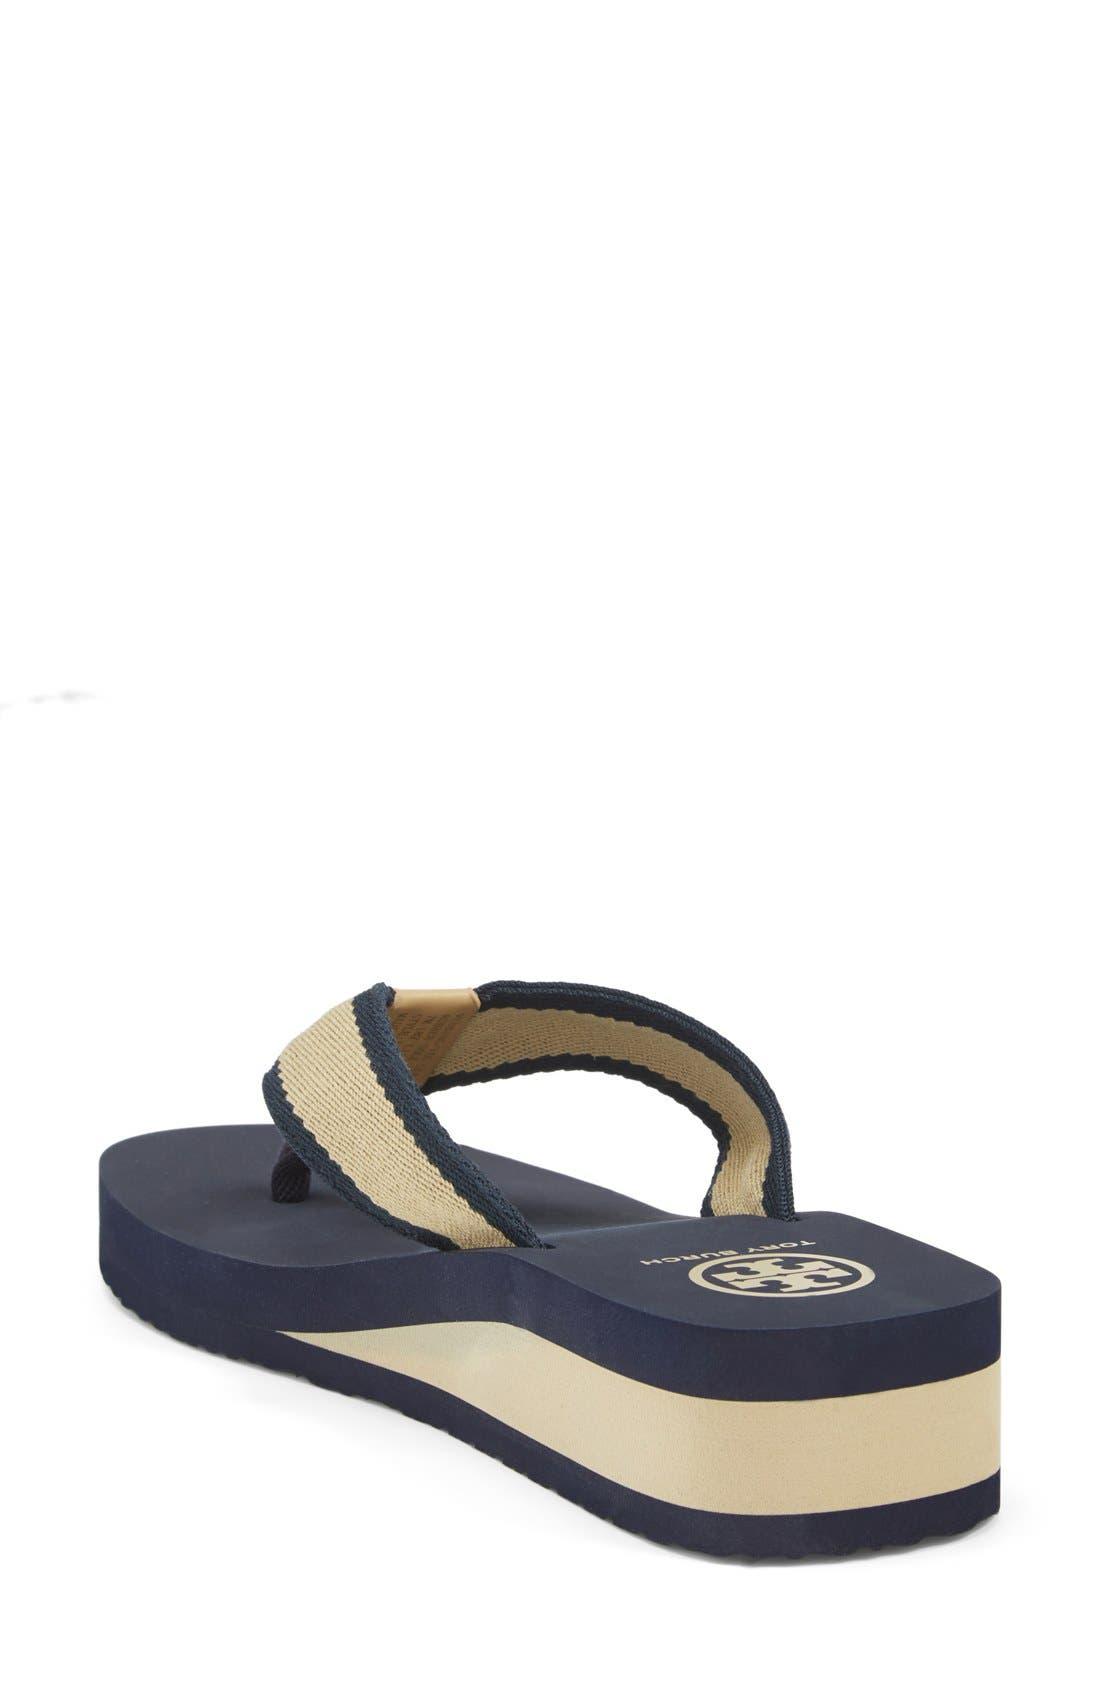 Alternate Image 2  - Tory Burch 'Frankie' Wedge Sandal (Women) (Nordstrom Exclusive)